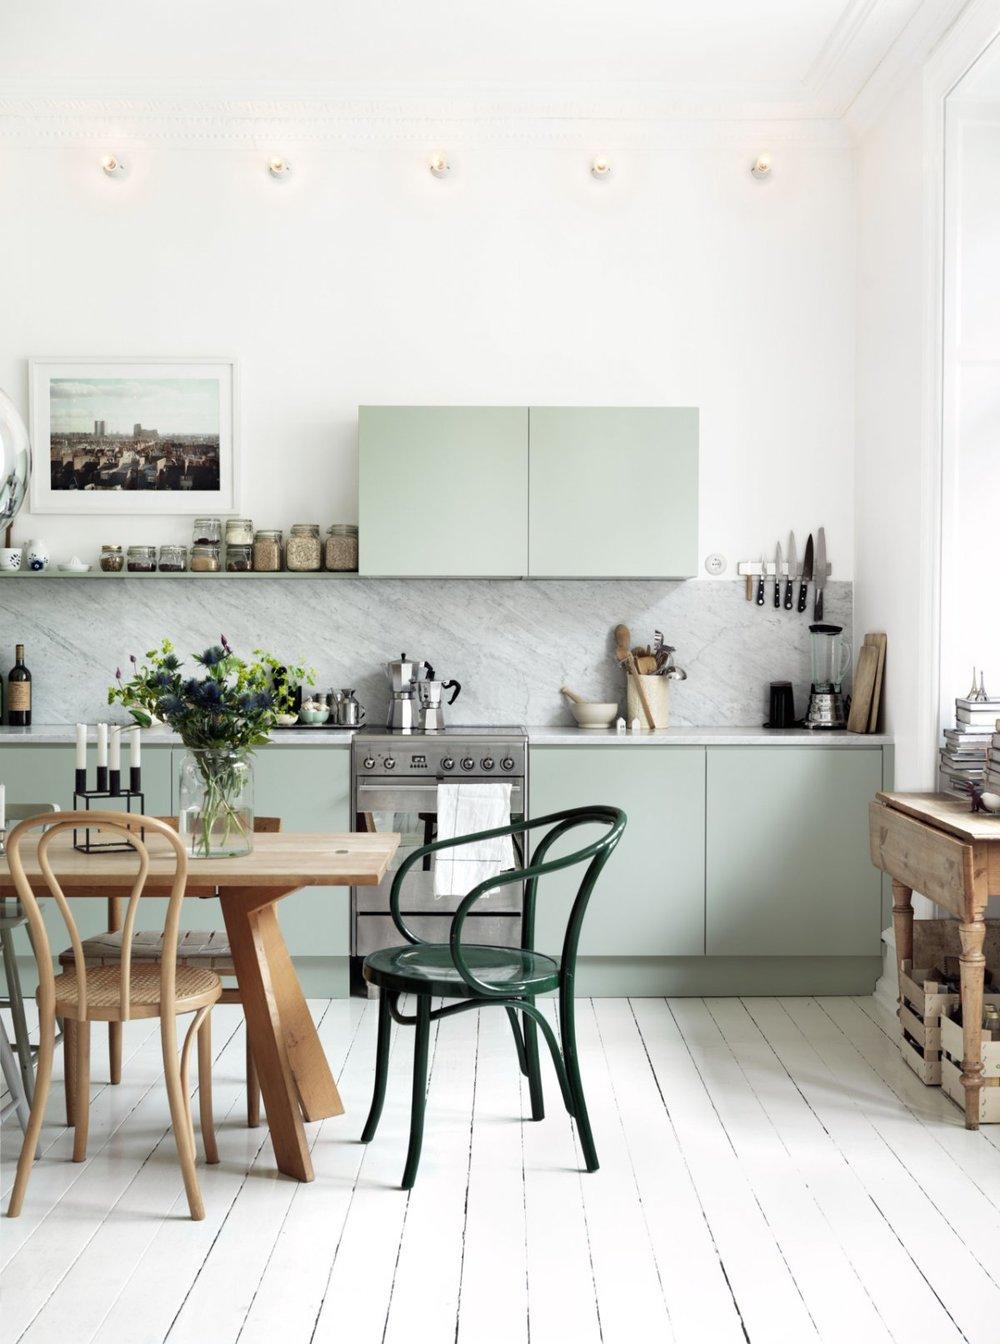 stylish-scandinavian-style-kitchen-tables-1025x768-together-with-gorgeous-scandinavian-kitchen-decorations-interior-photo-scandinavian-style.jpg